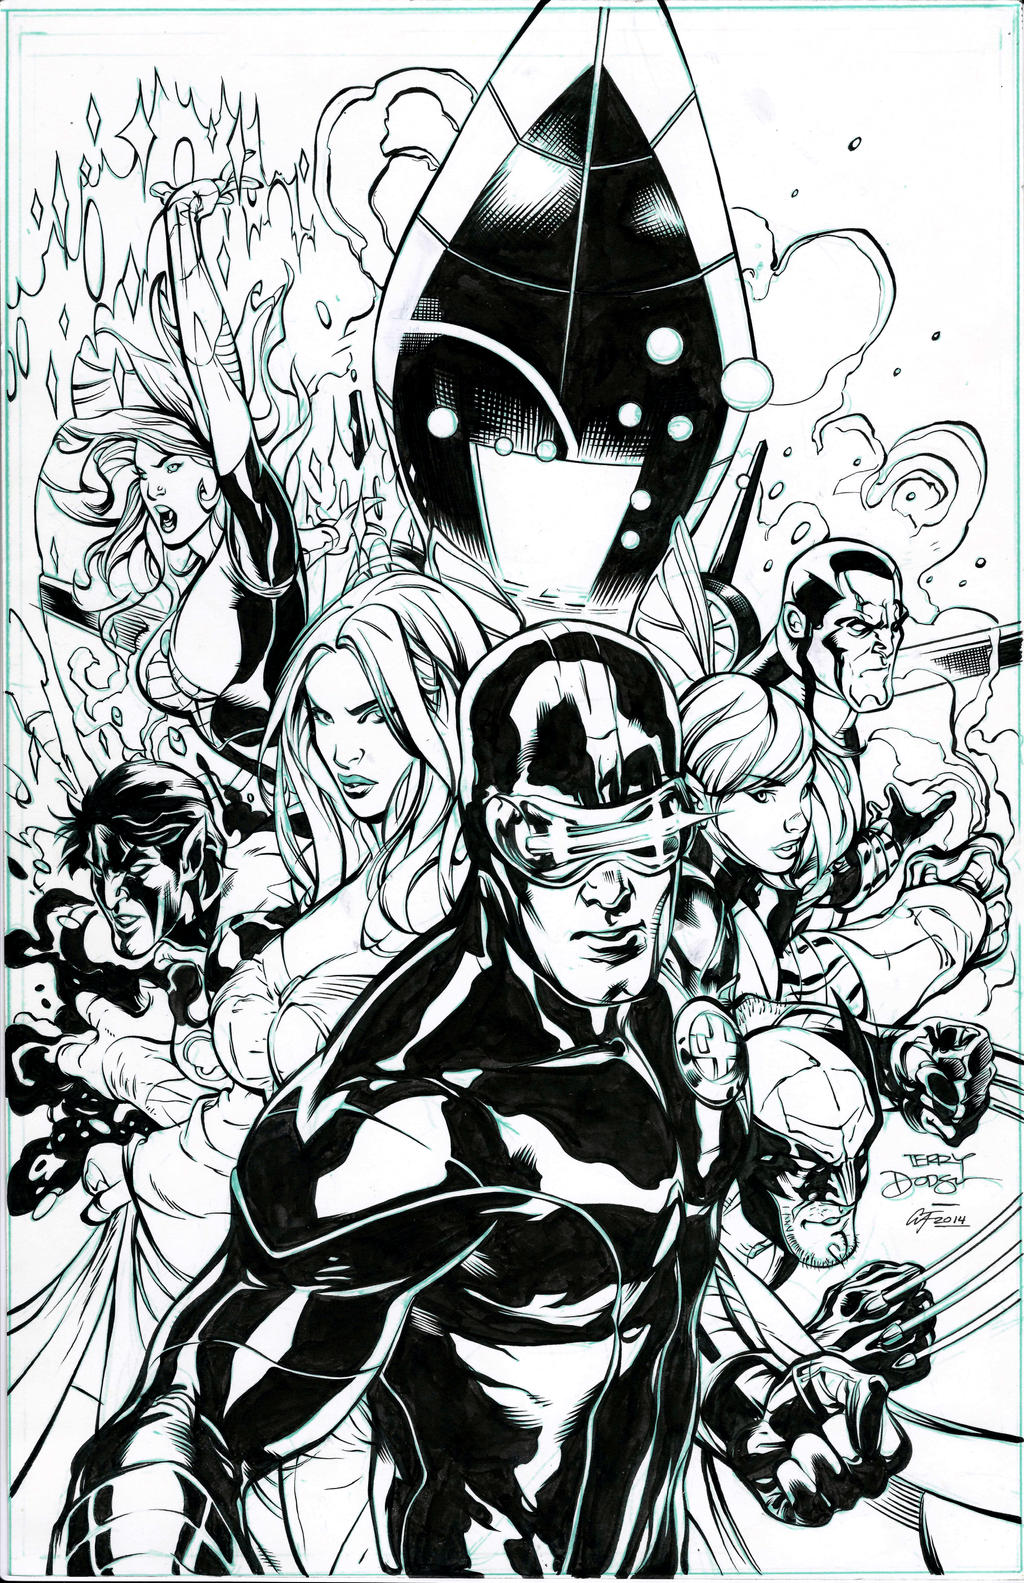 Uncanny X-Men #505 Cover by Terry Dodson by afowlerart